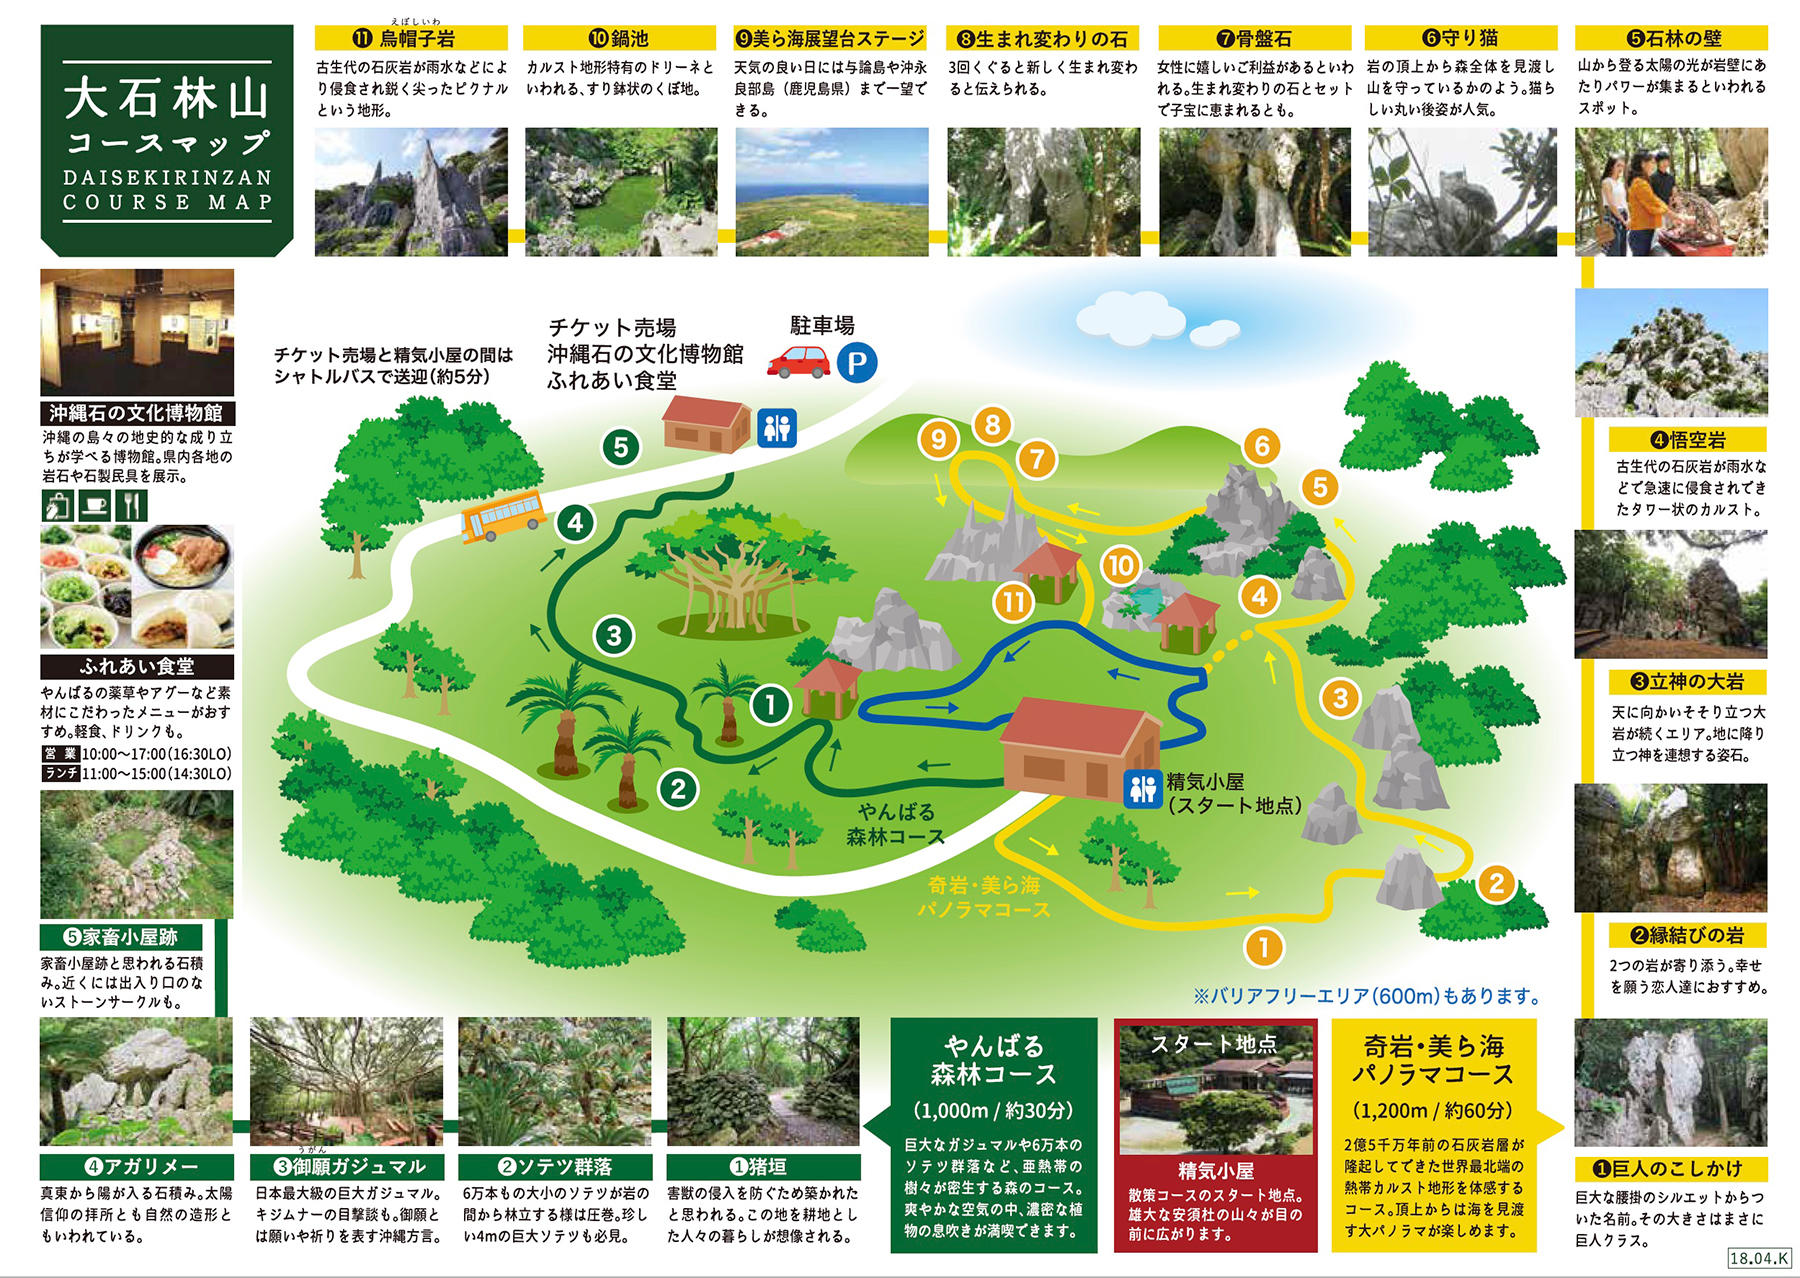 https://nanto.sakura.ne.jp/sekirinzan2018/cours/corse-A4map.jpg